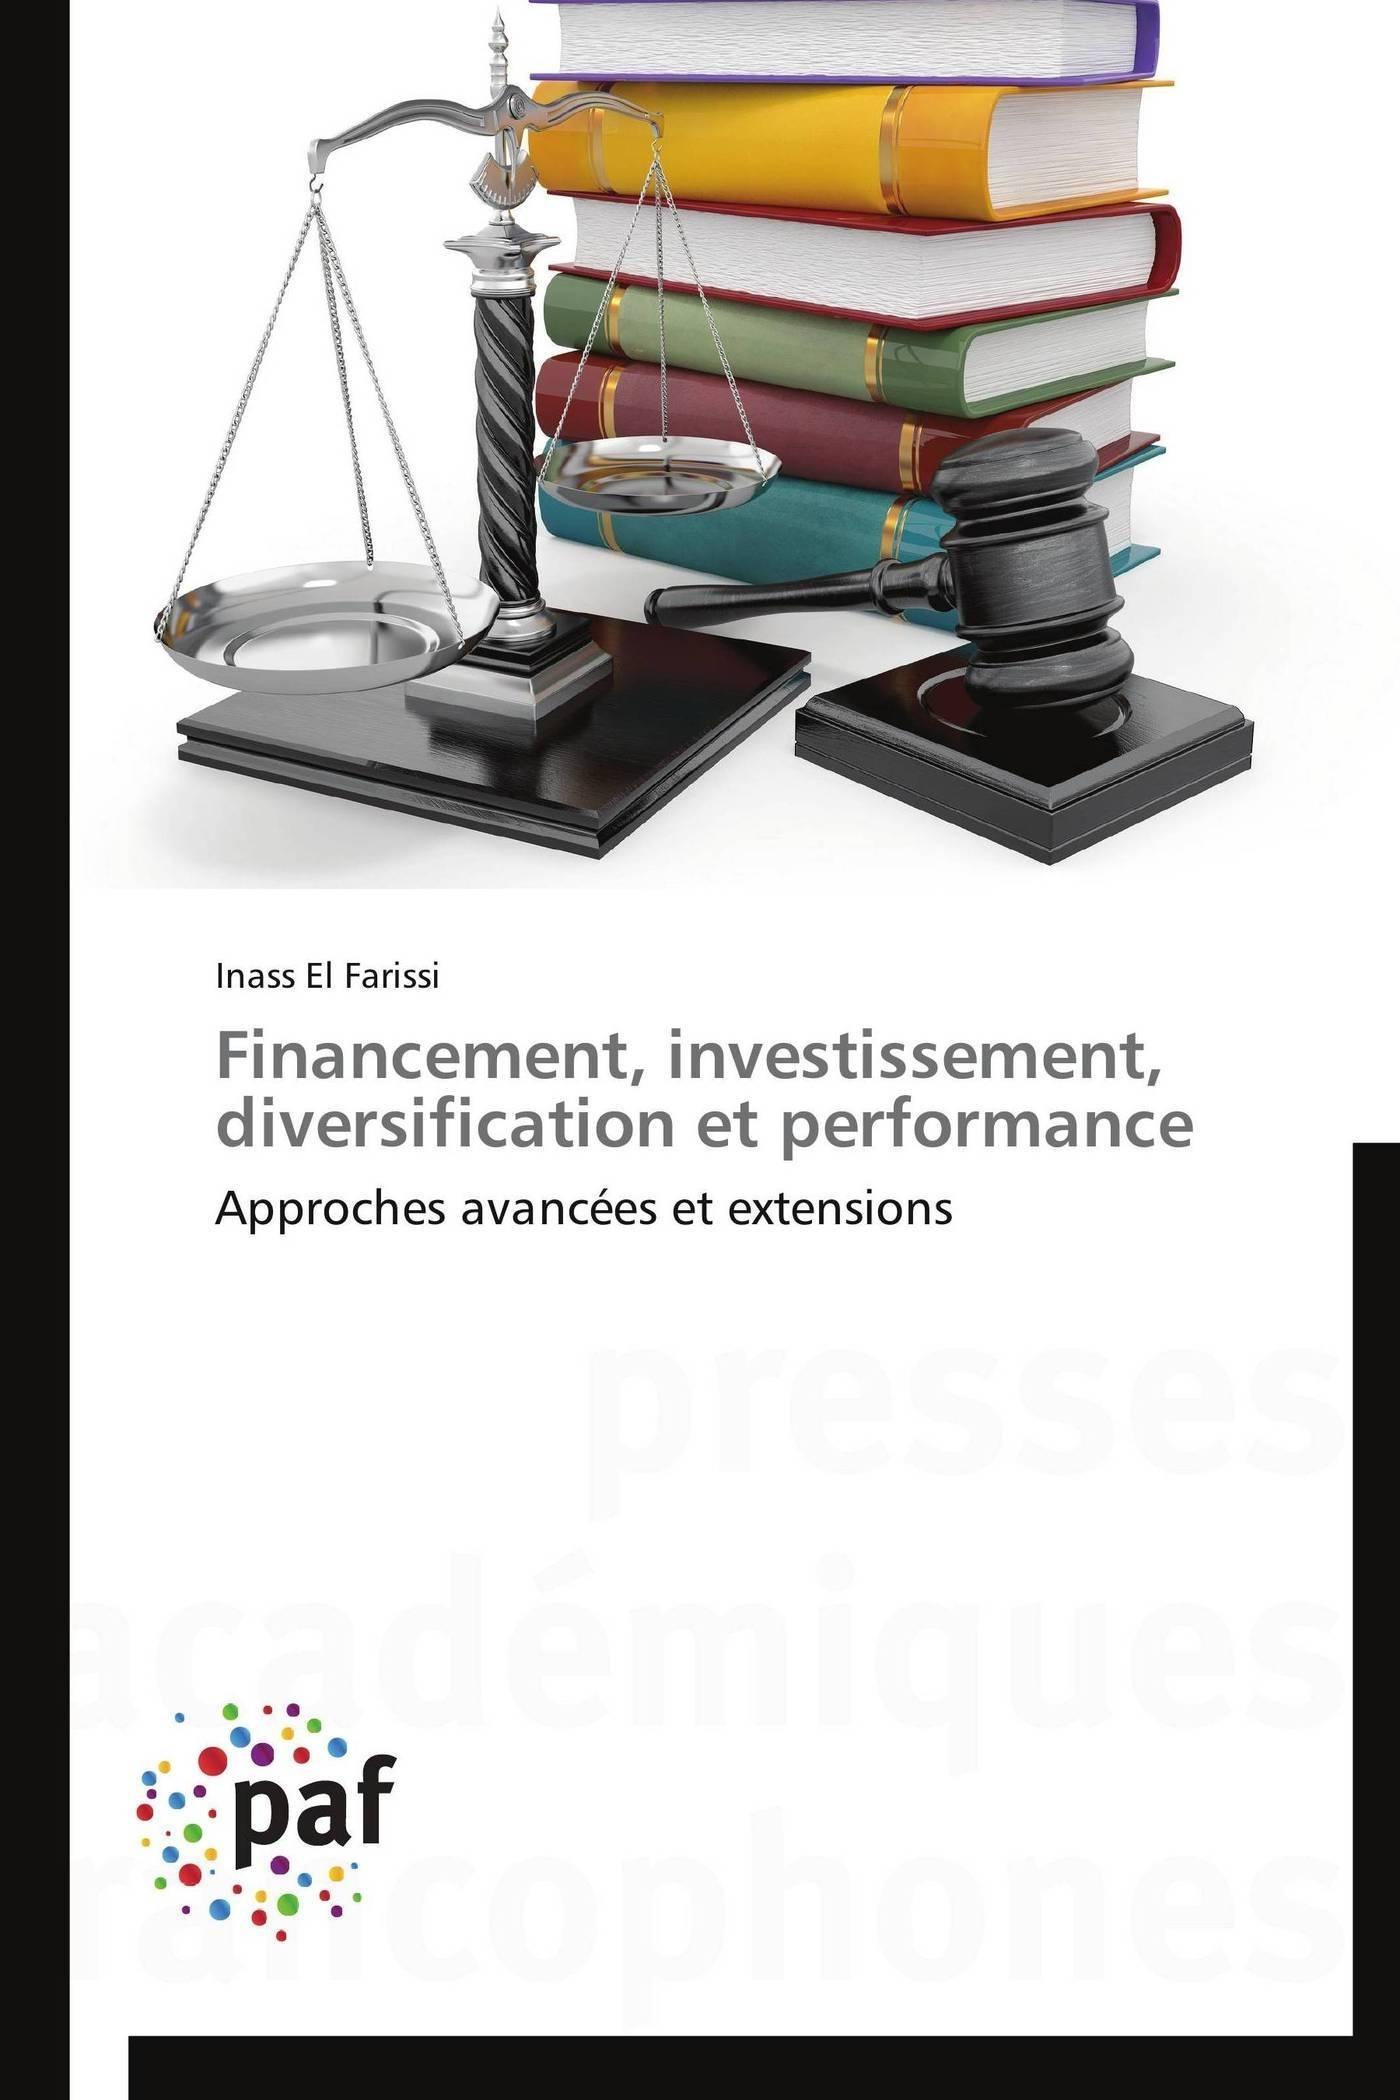 FINANCEMENT, INVESTISSEMENT, DIVERSIFICATION ET PERFORMANCE